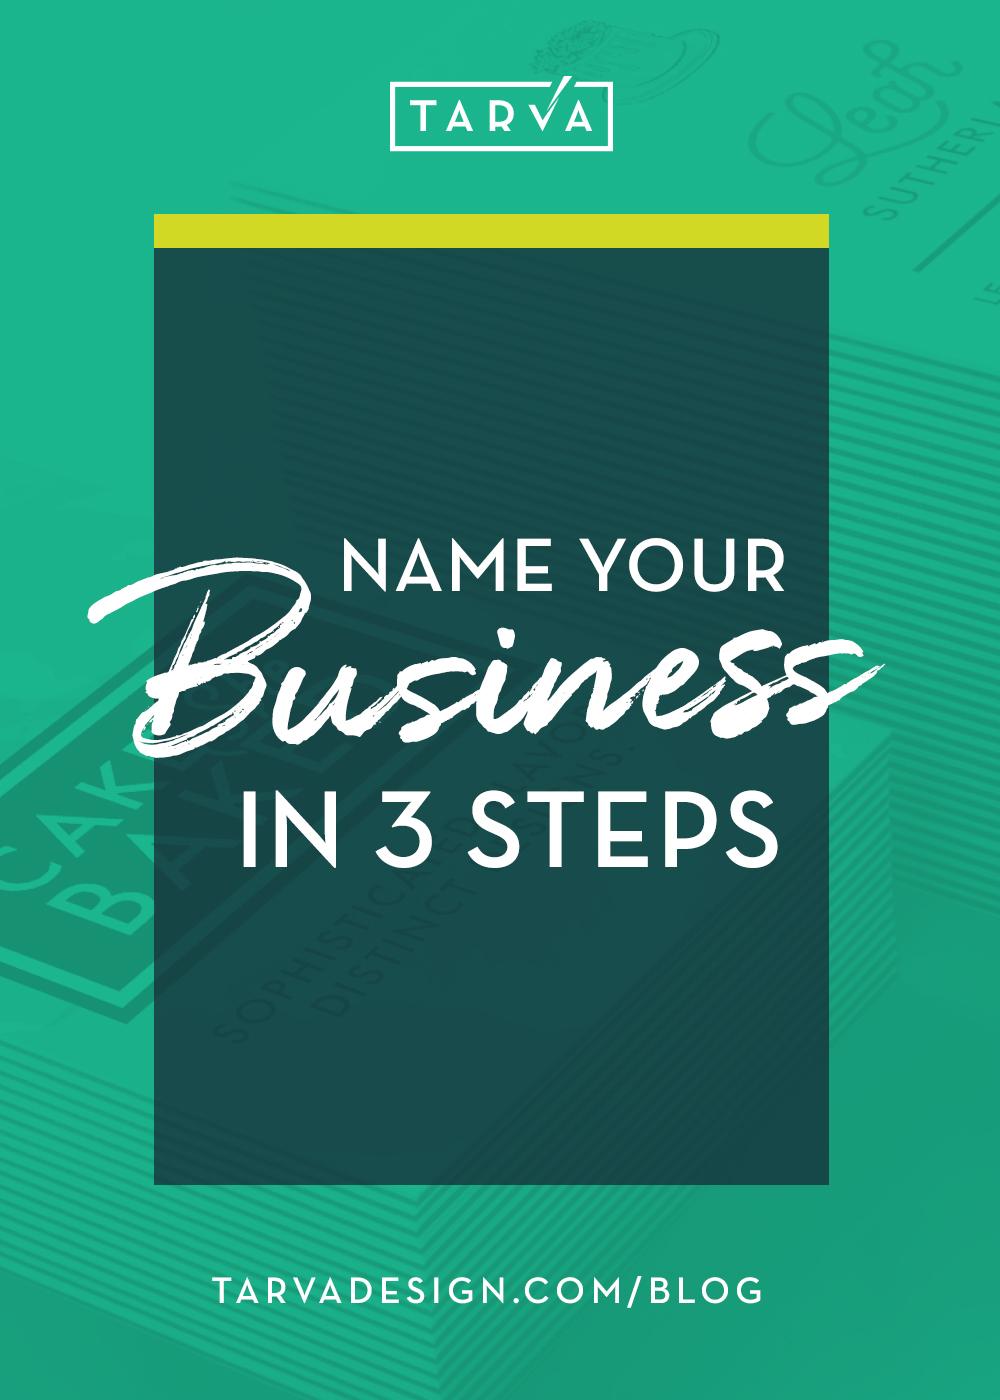 Tarva+Design+Studio_Name+Your+Business_Blog+Post.jpg